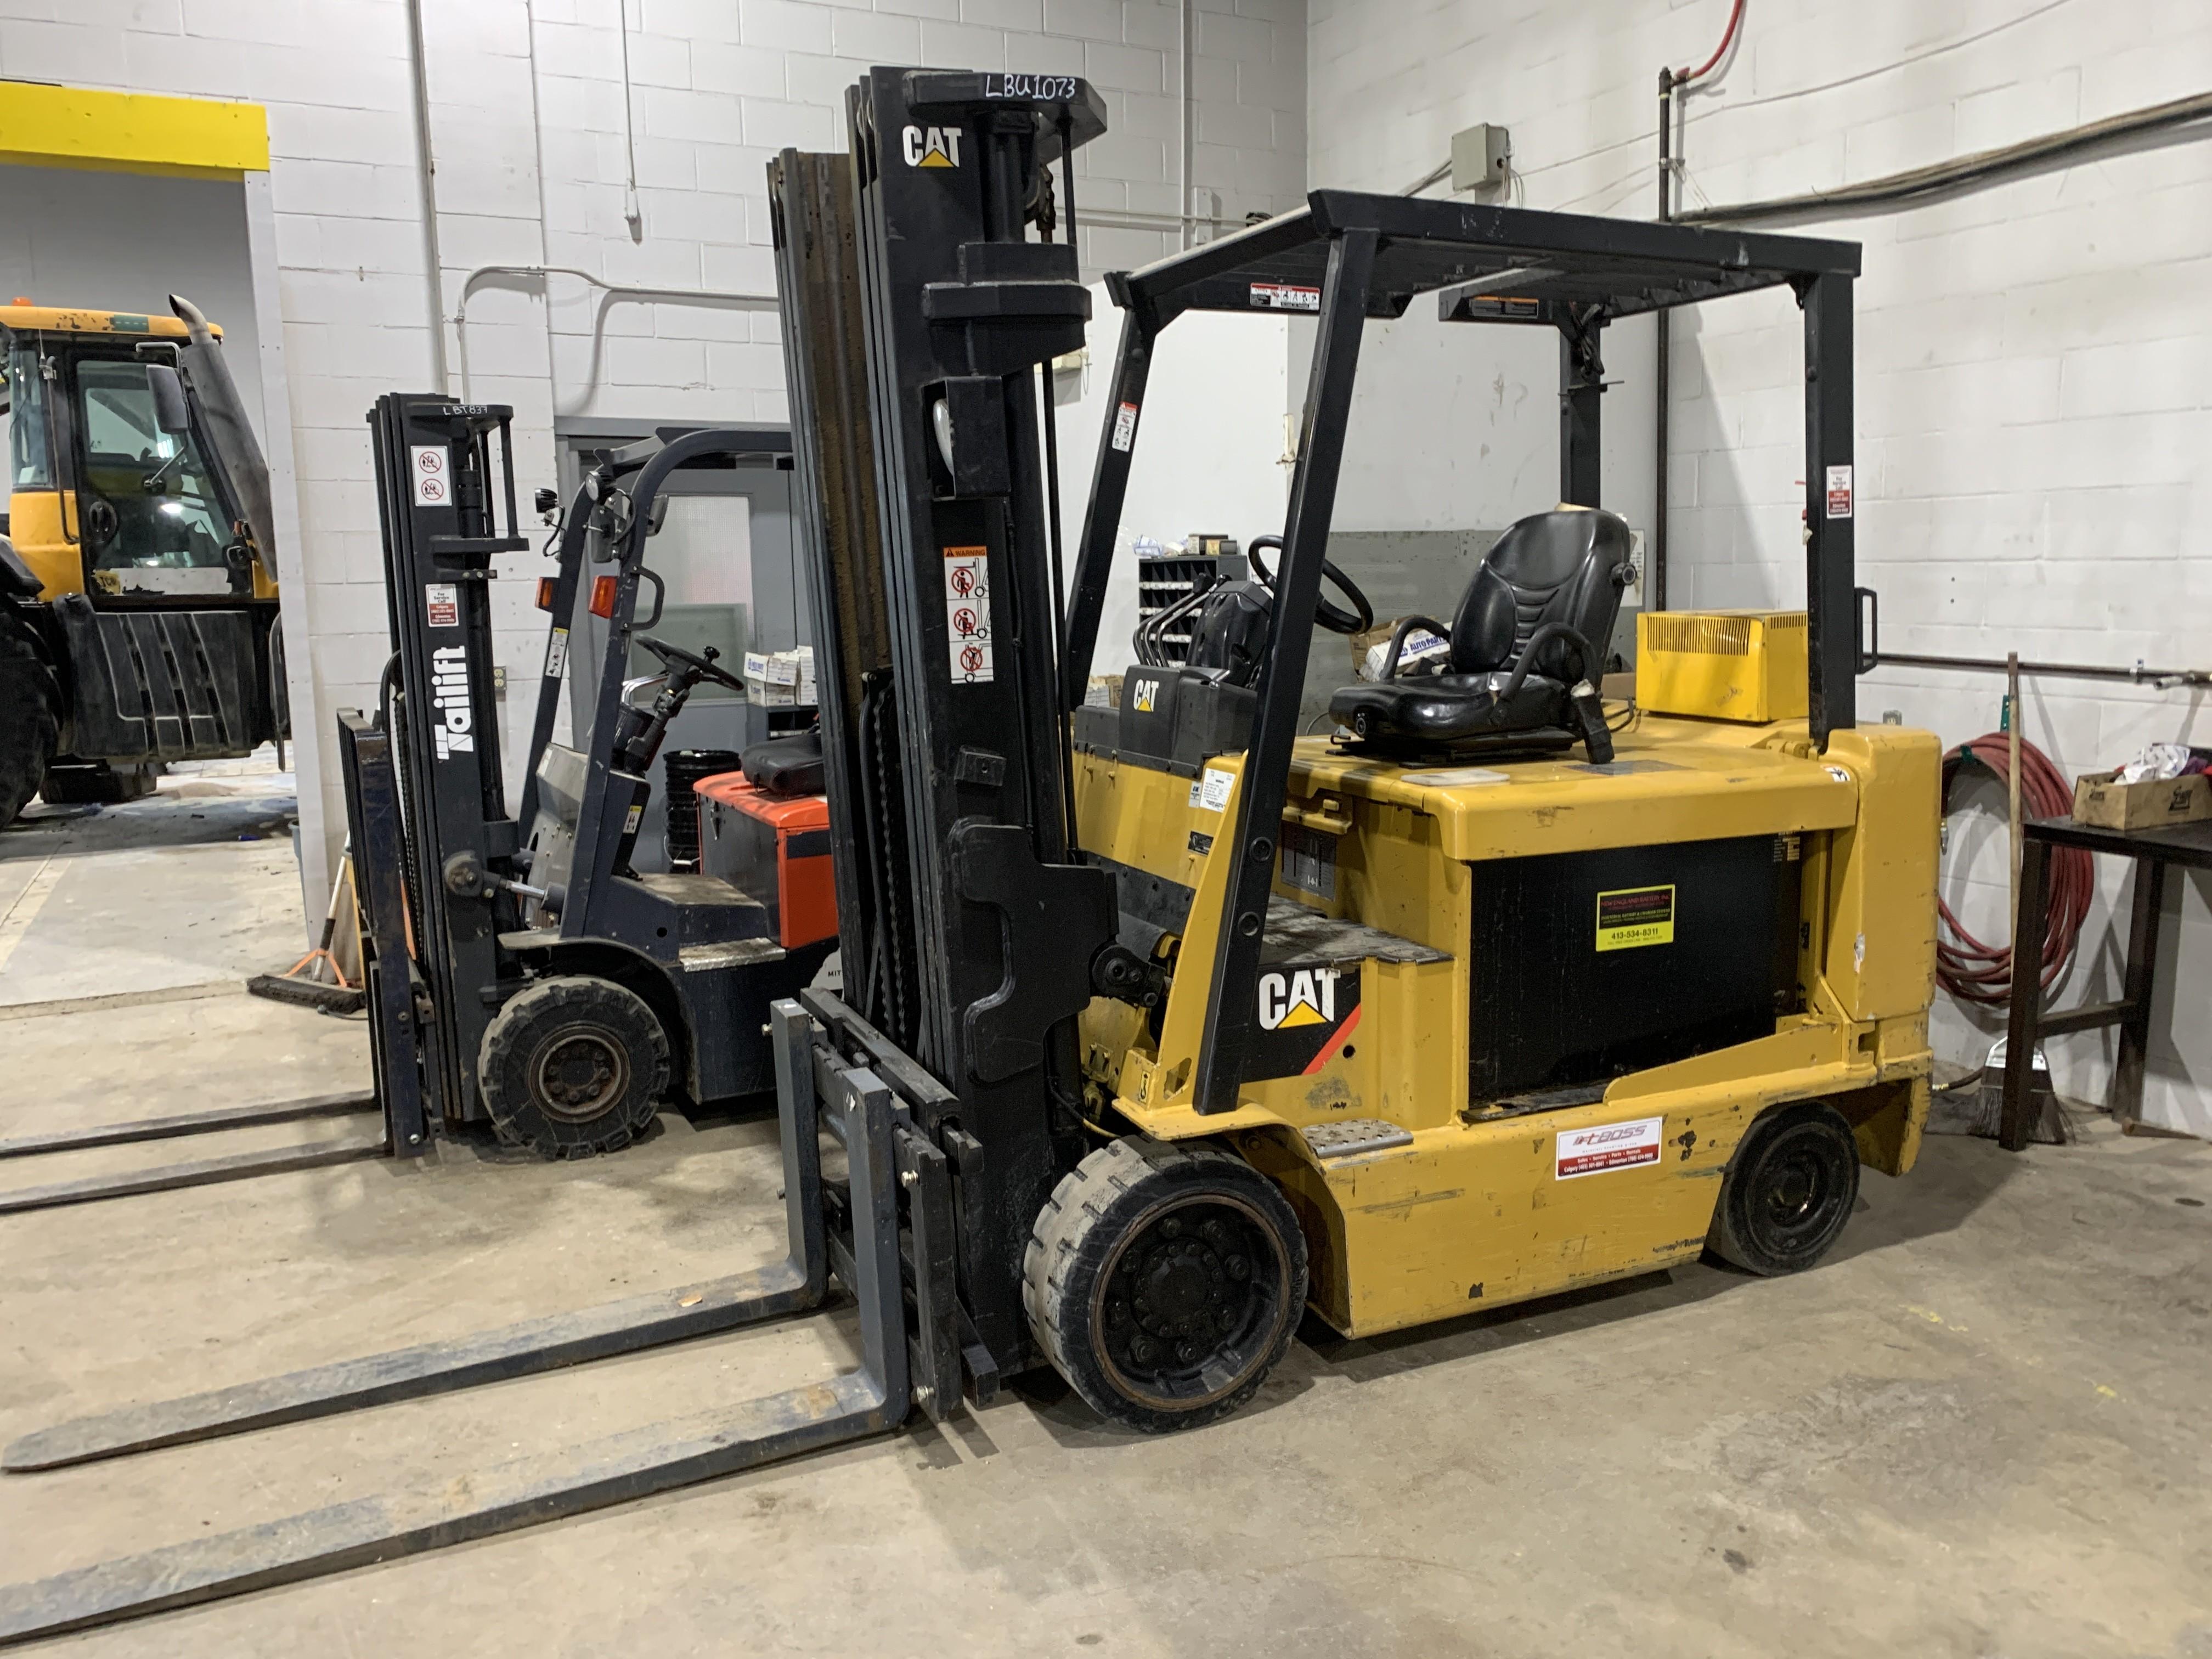 Used, 2008, CAT Lift Trucks, E10000, Forklifts / Lift Trucks